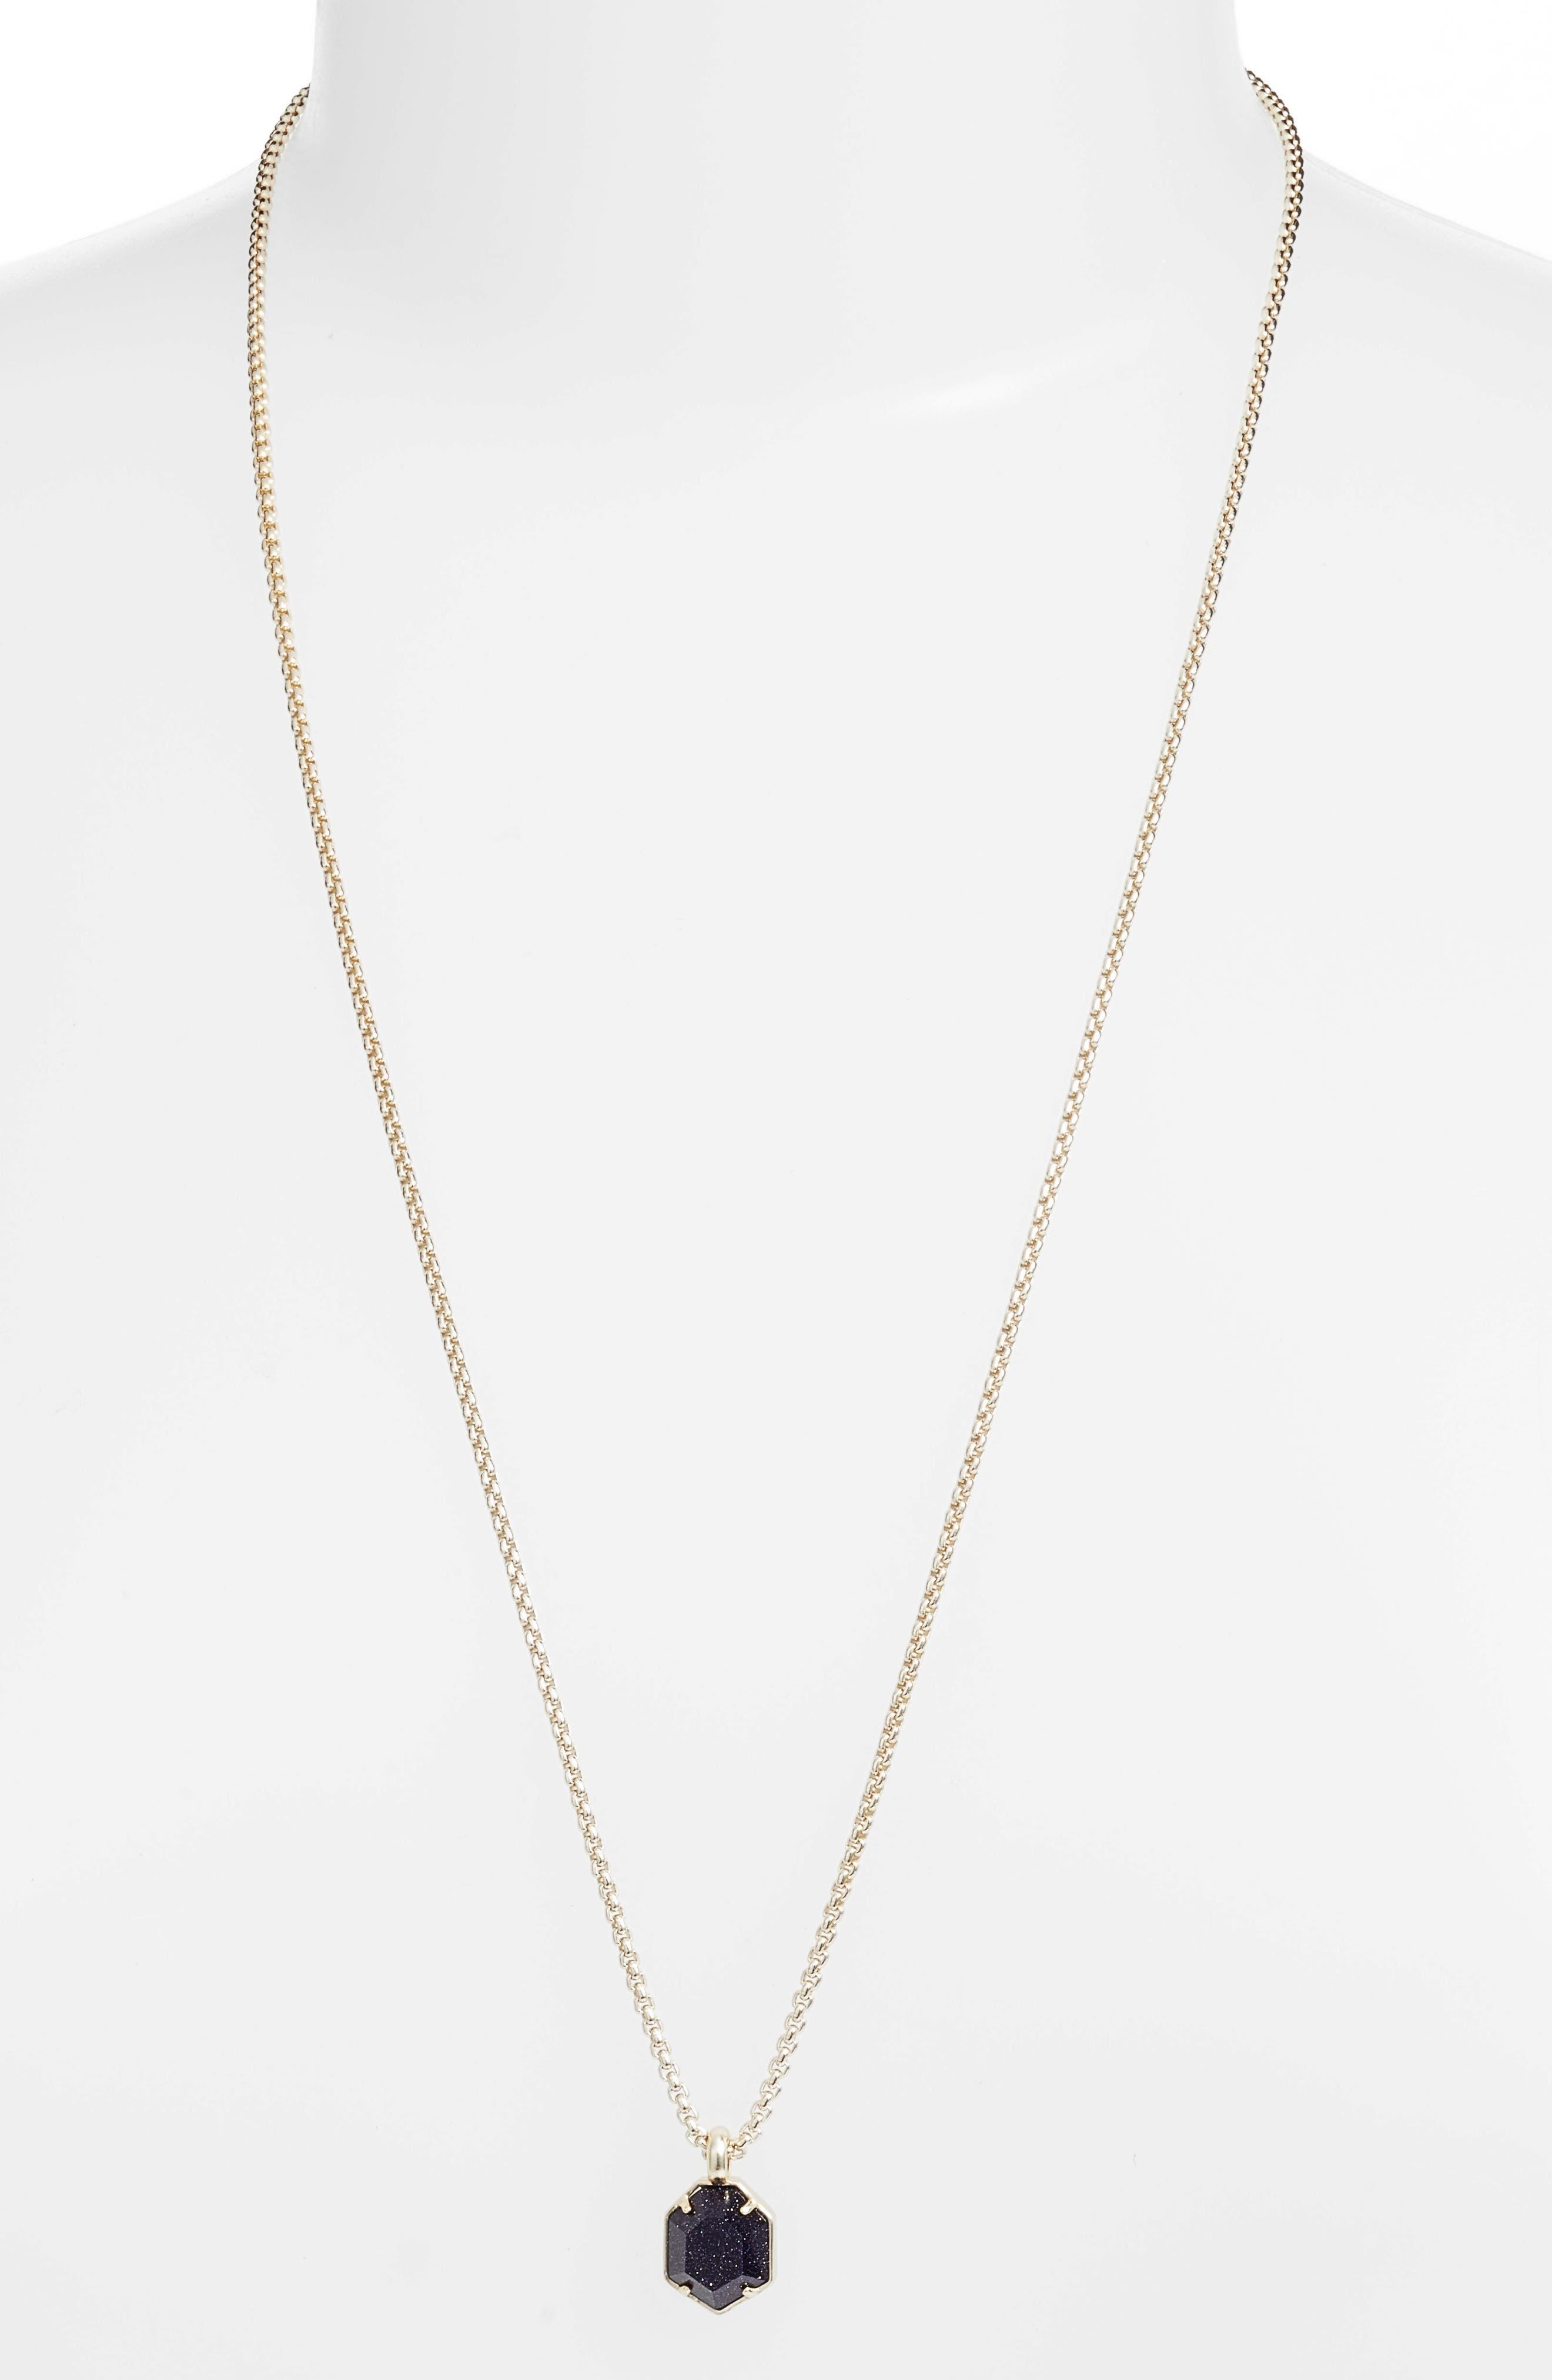 Kendra Scott Teo Semiprecious Pendant Necklace (Nordstrom Exclusive)